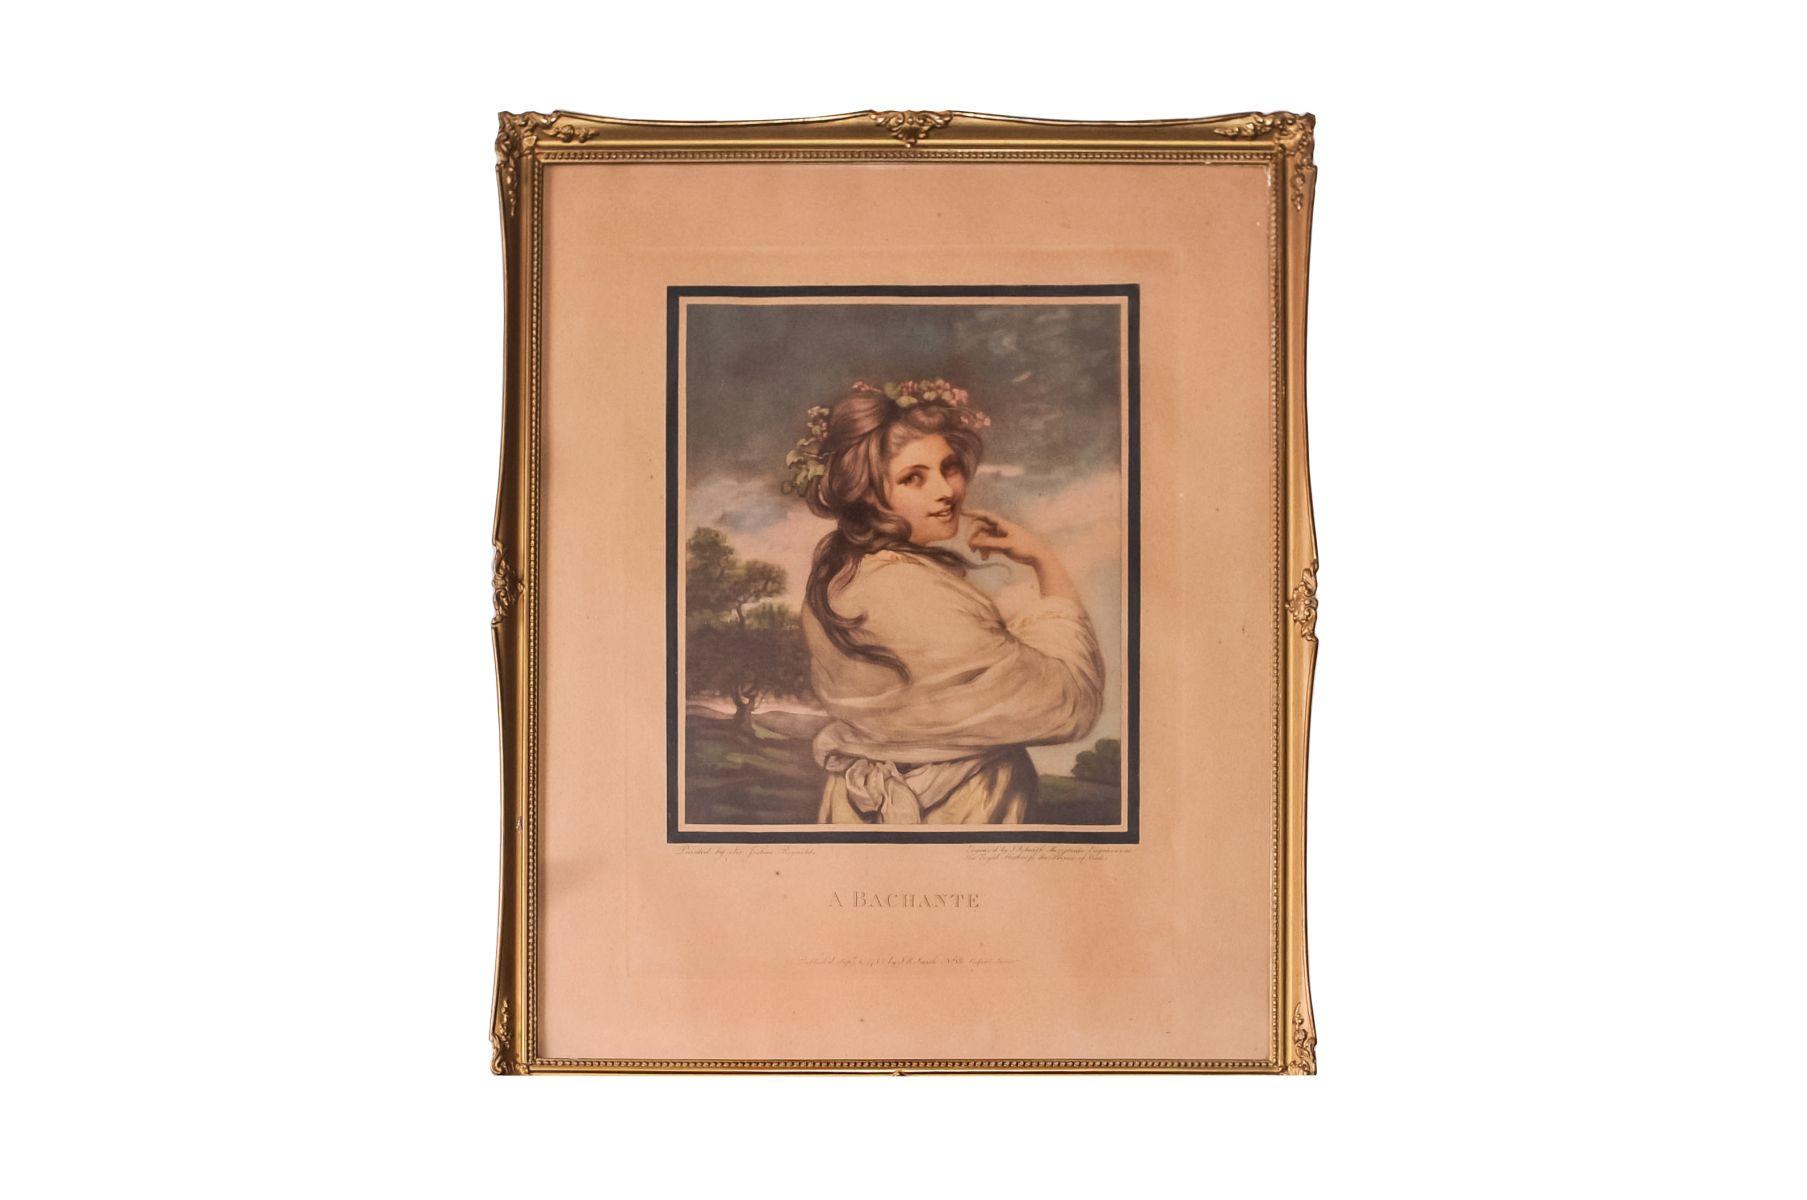 "#13 J.R. Smith (1751-1812) ""A Bachante"" 1781 | J.R. Smith (1751-1812) ""A Bachante"" 1781 Image"